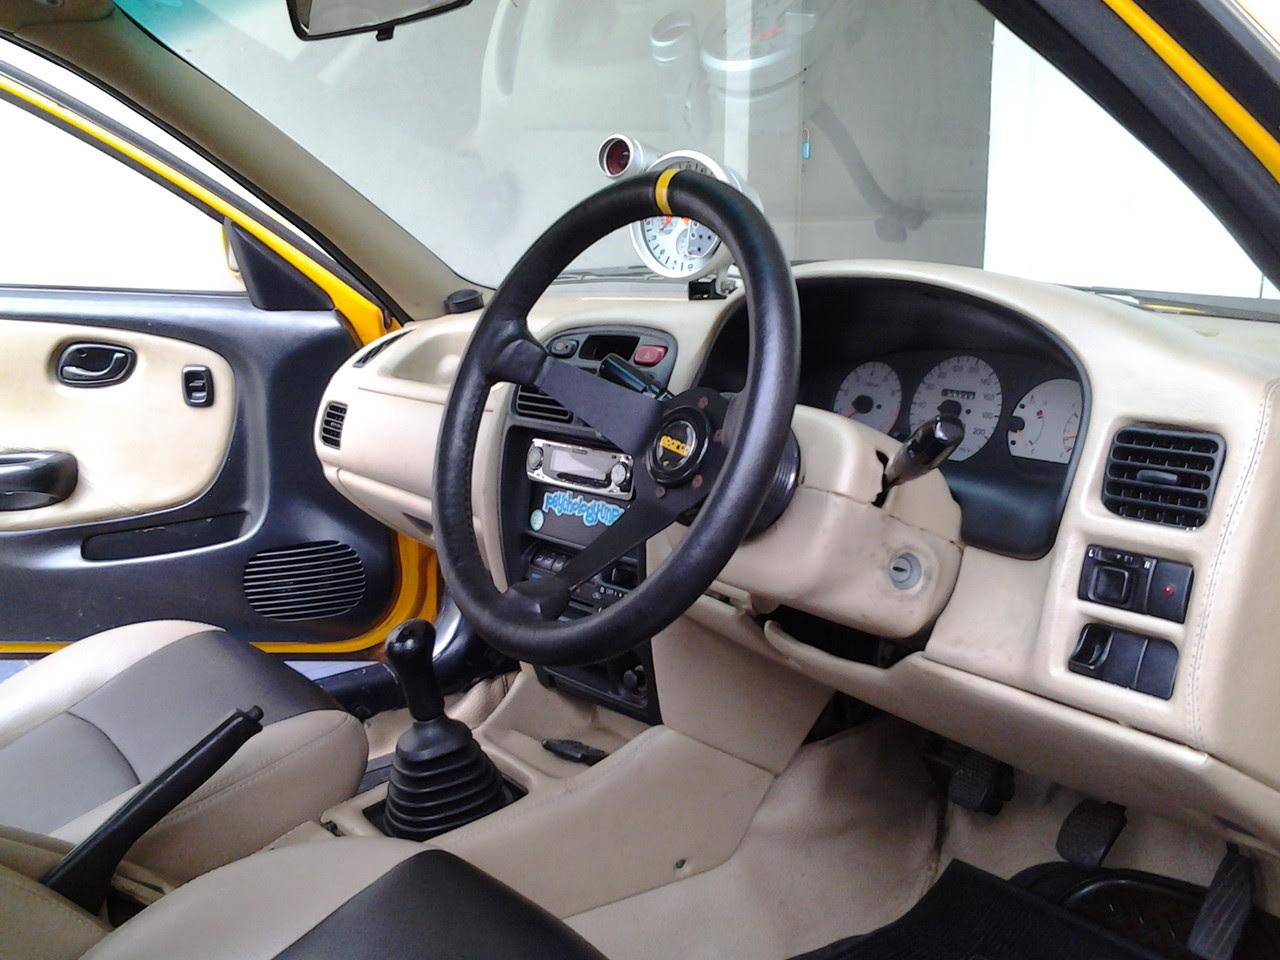 430 Modifikasi Mobil Baleno 2002 Terbaru